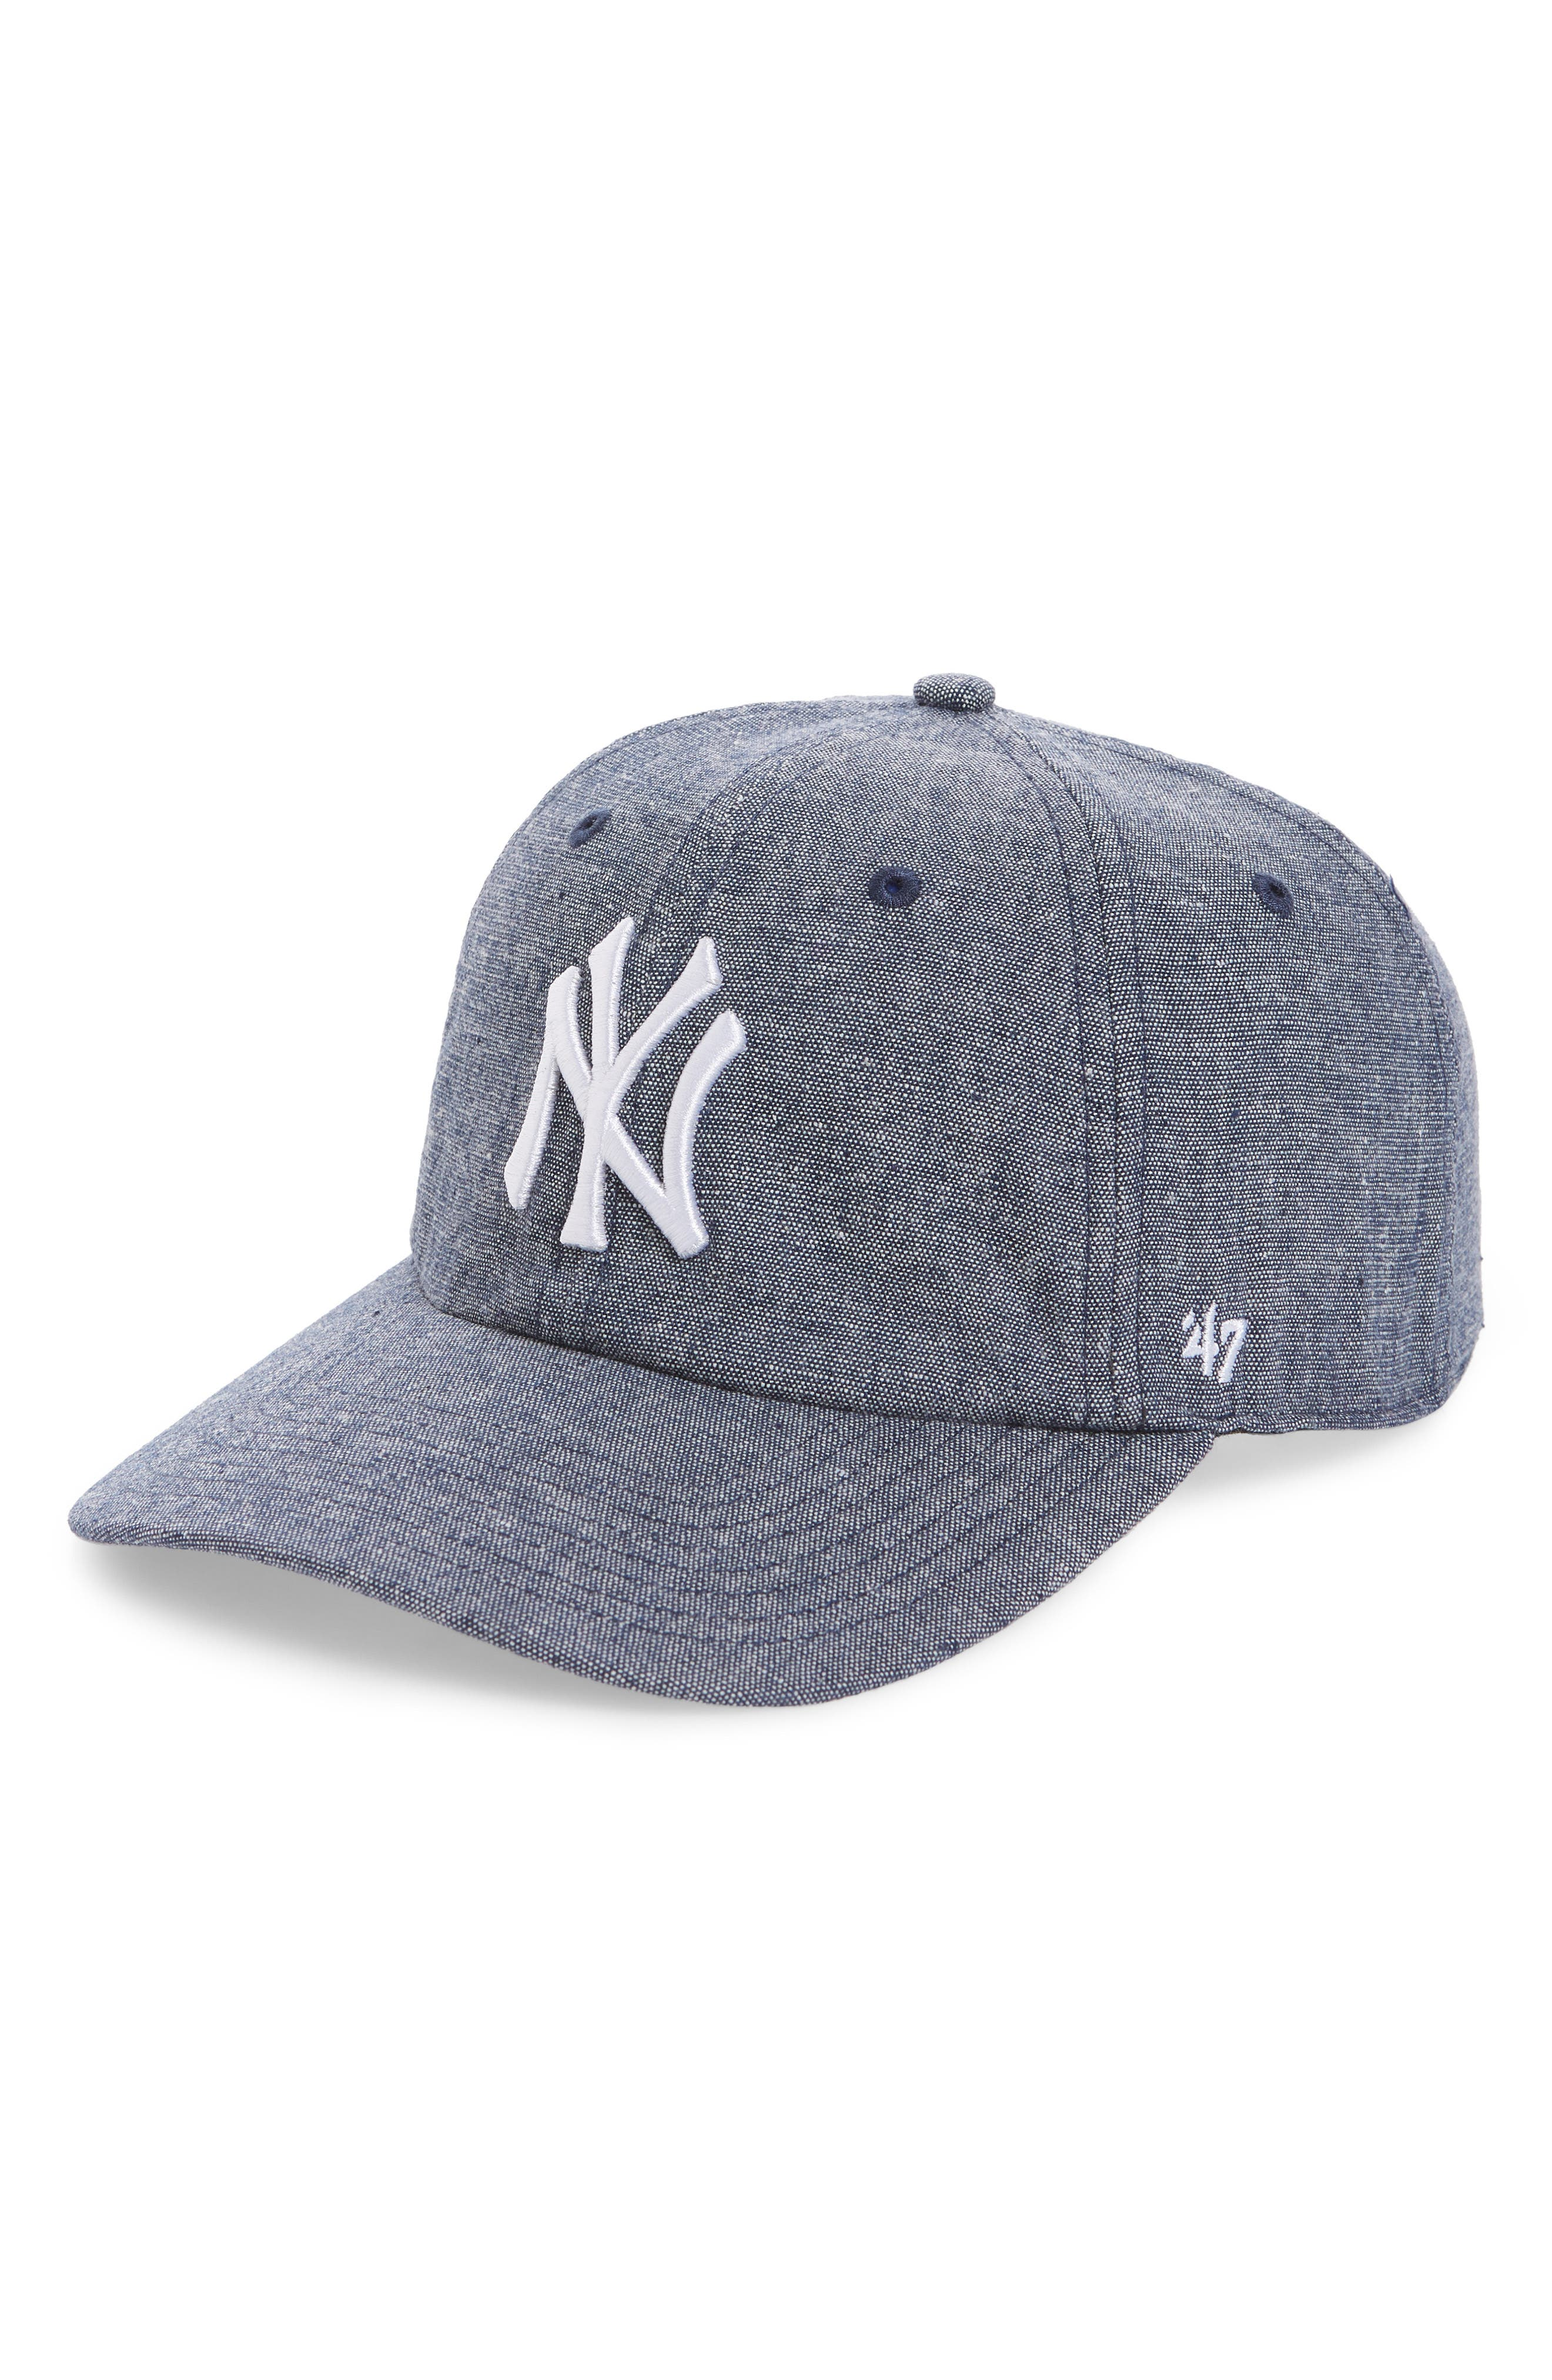 87eb723b ... denmark 47 emery clean up ny yankees baseball cap 89a04 466ac